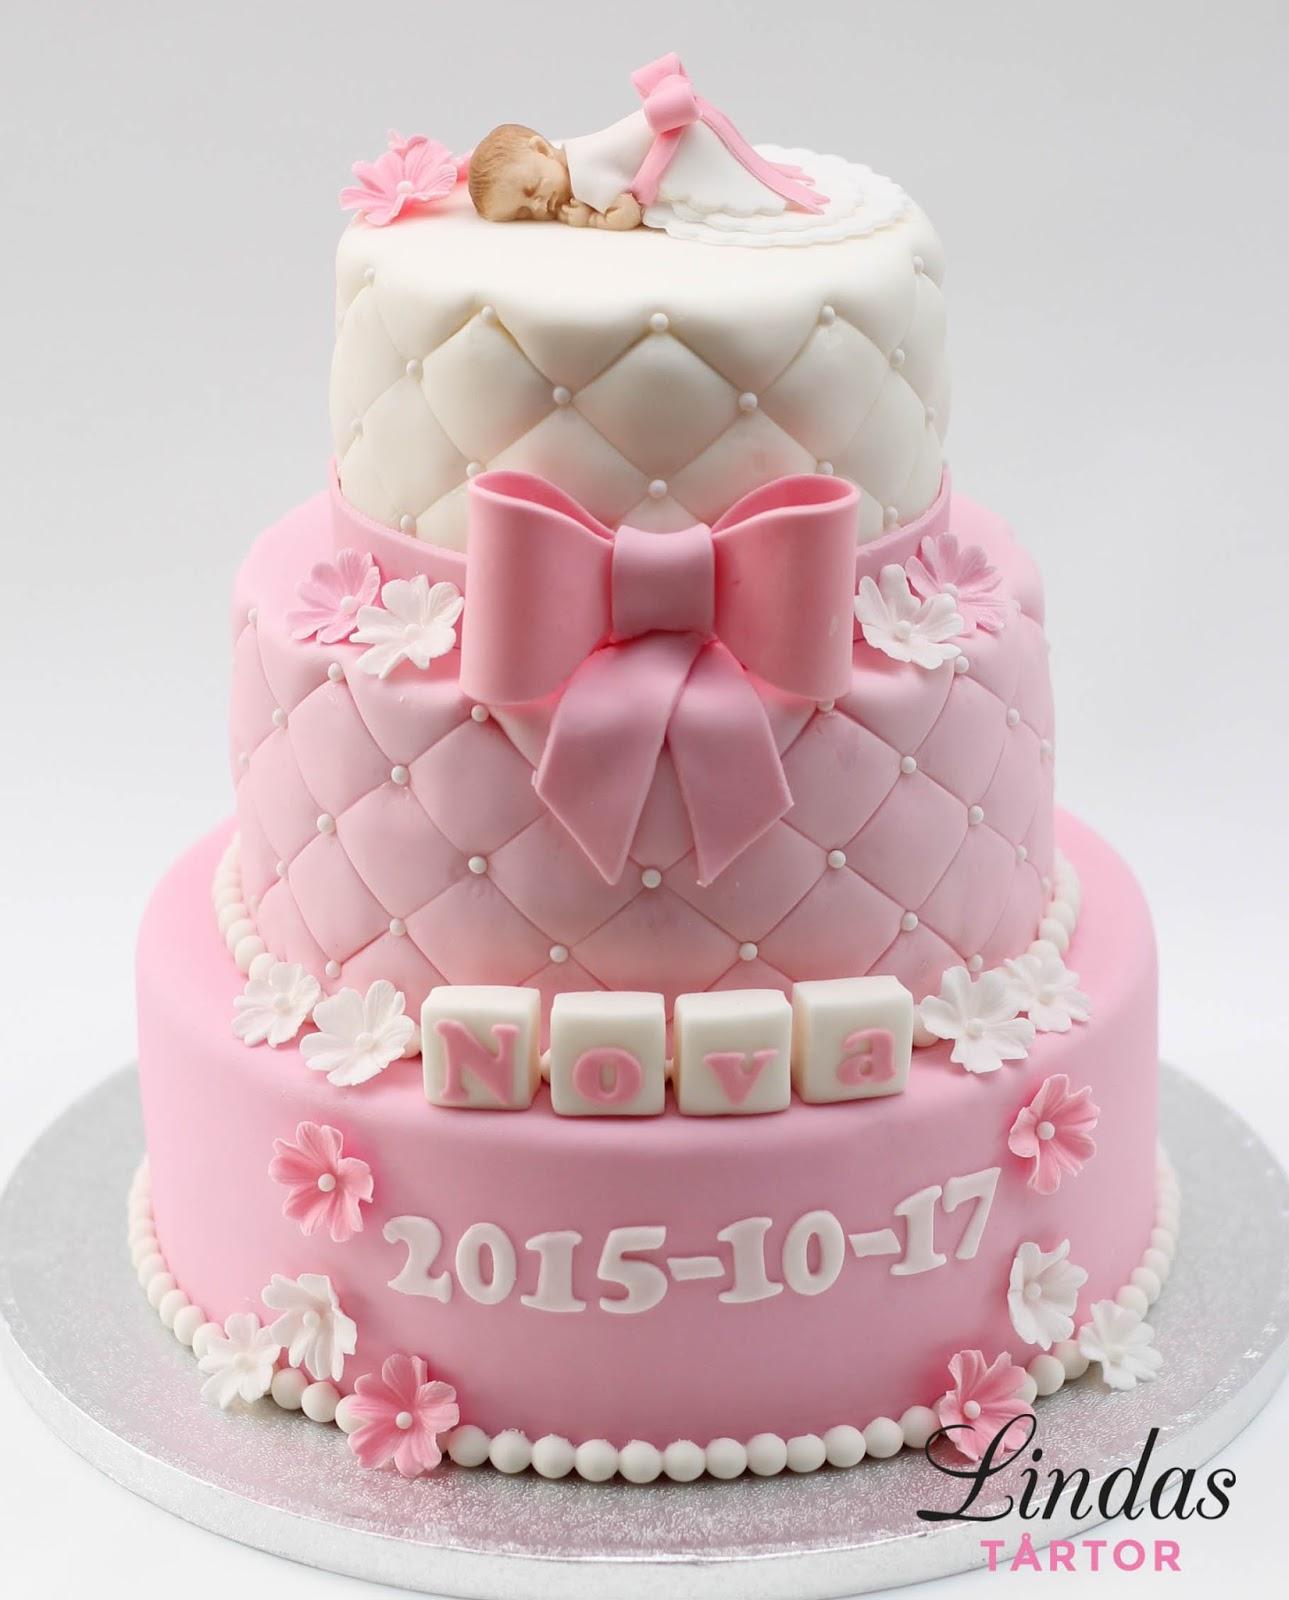 tårta till dop